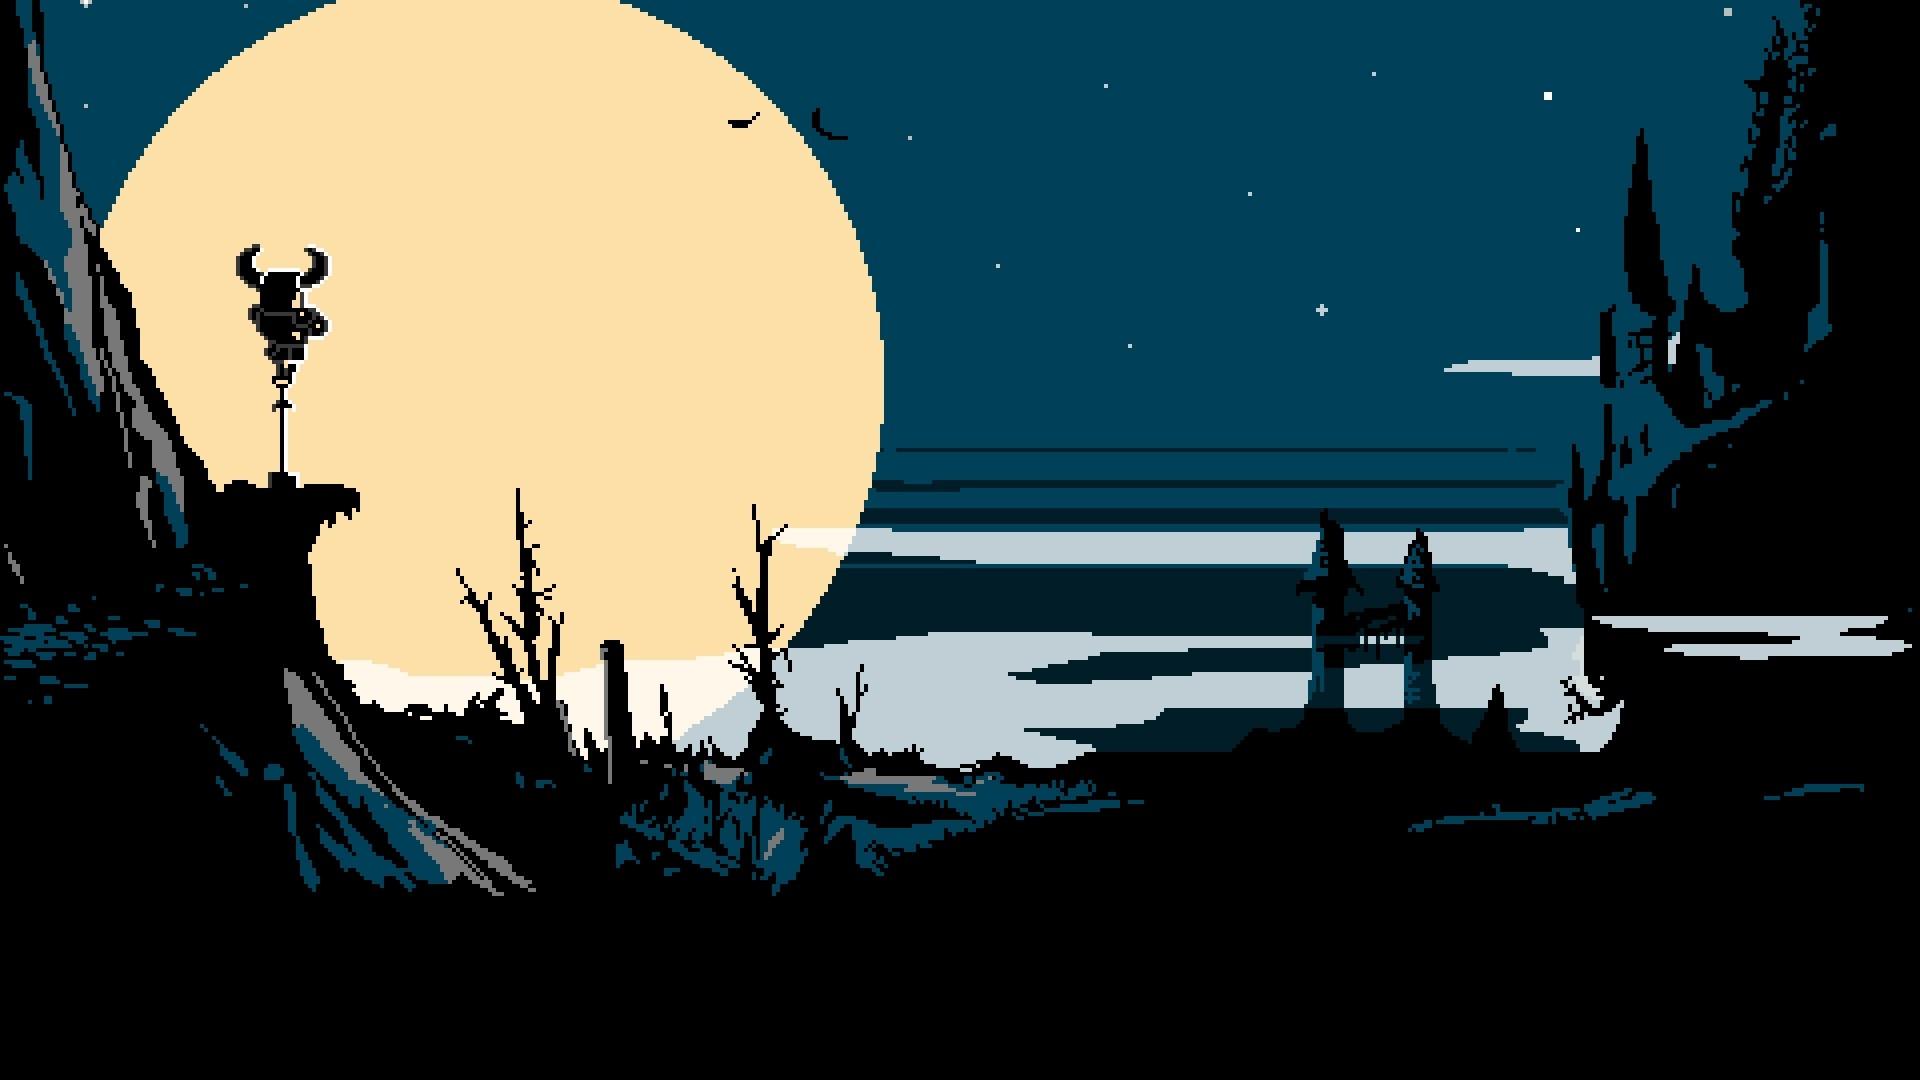 Popular Wallpaper Night Cartoon - landscape-illustration-digital-art-video-games-night-pixel-art-nature-silhouette-stars-branch-Moon-cartoon-hills-retro-games-pixels-8-bit-pixelated-Shovel-Knight-darkness-screenshot-computer-wallpaper-album-cover-24164  Gallery.jpg